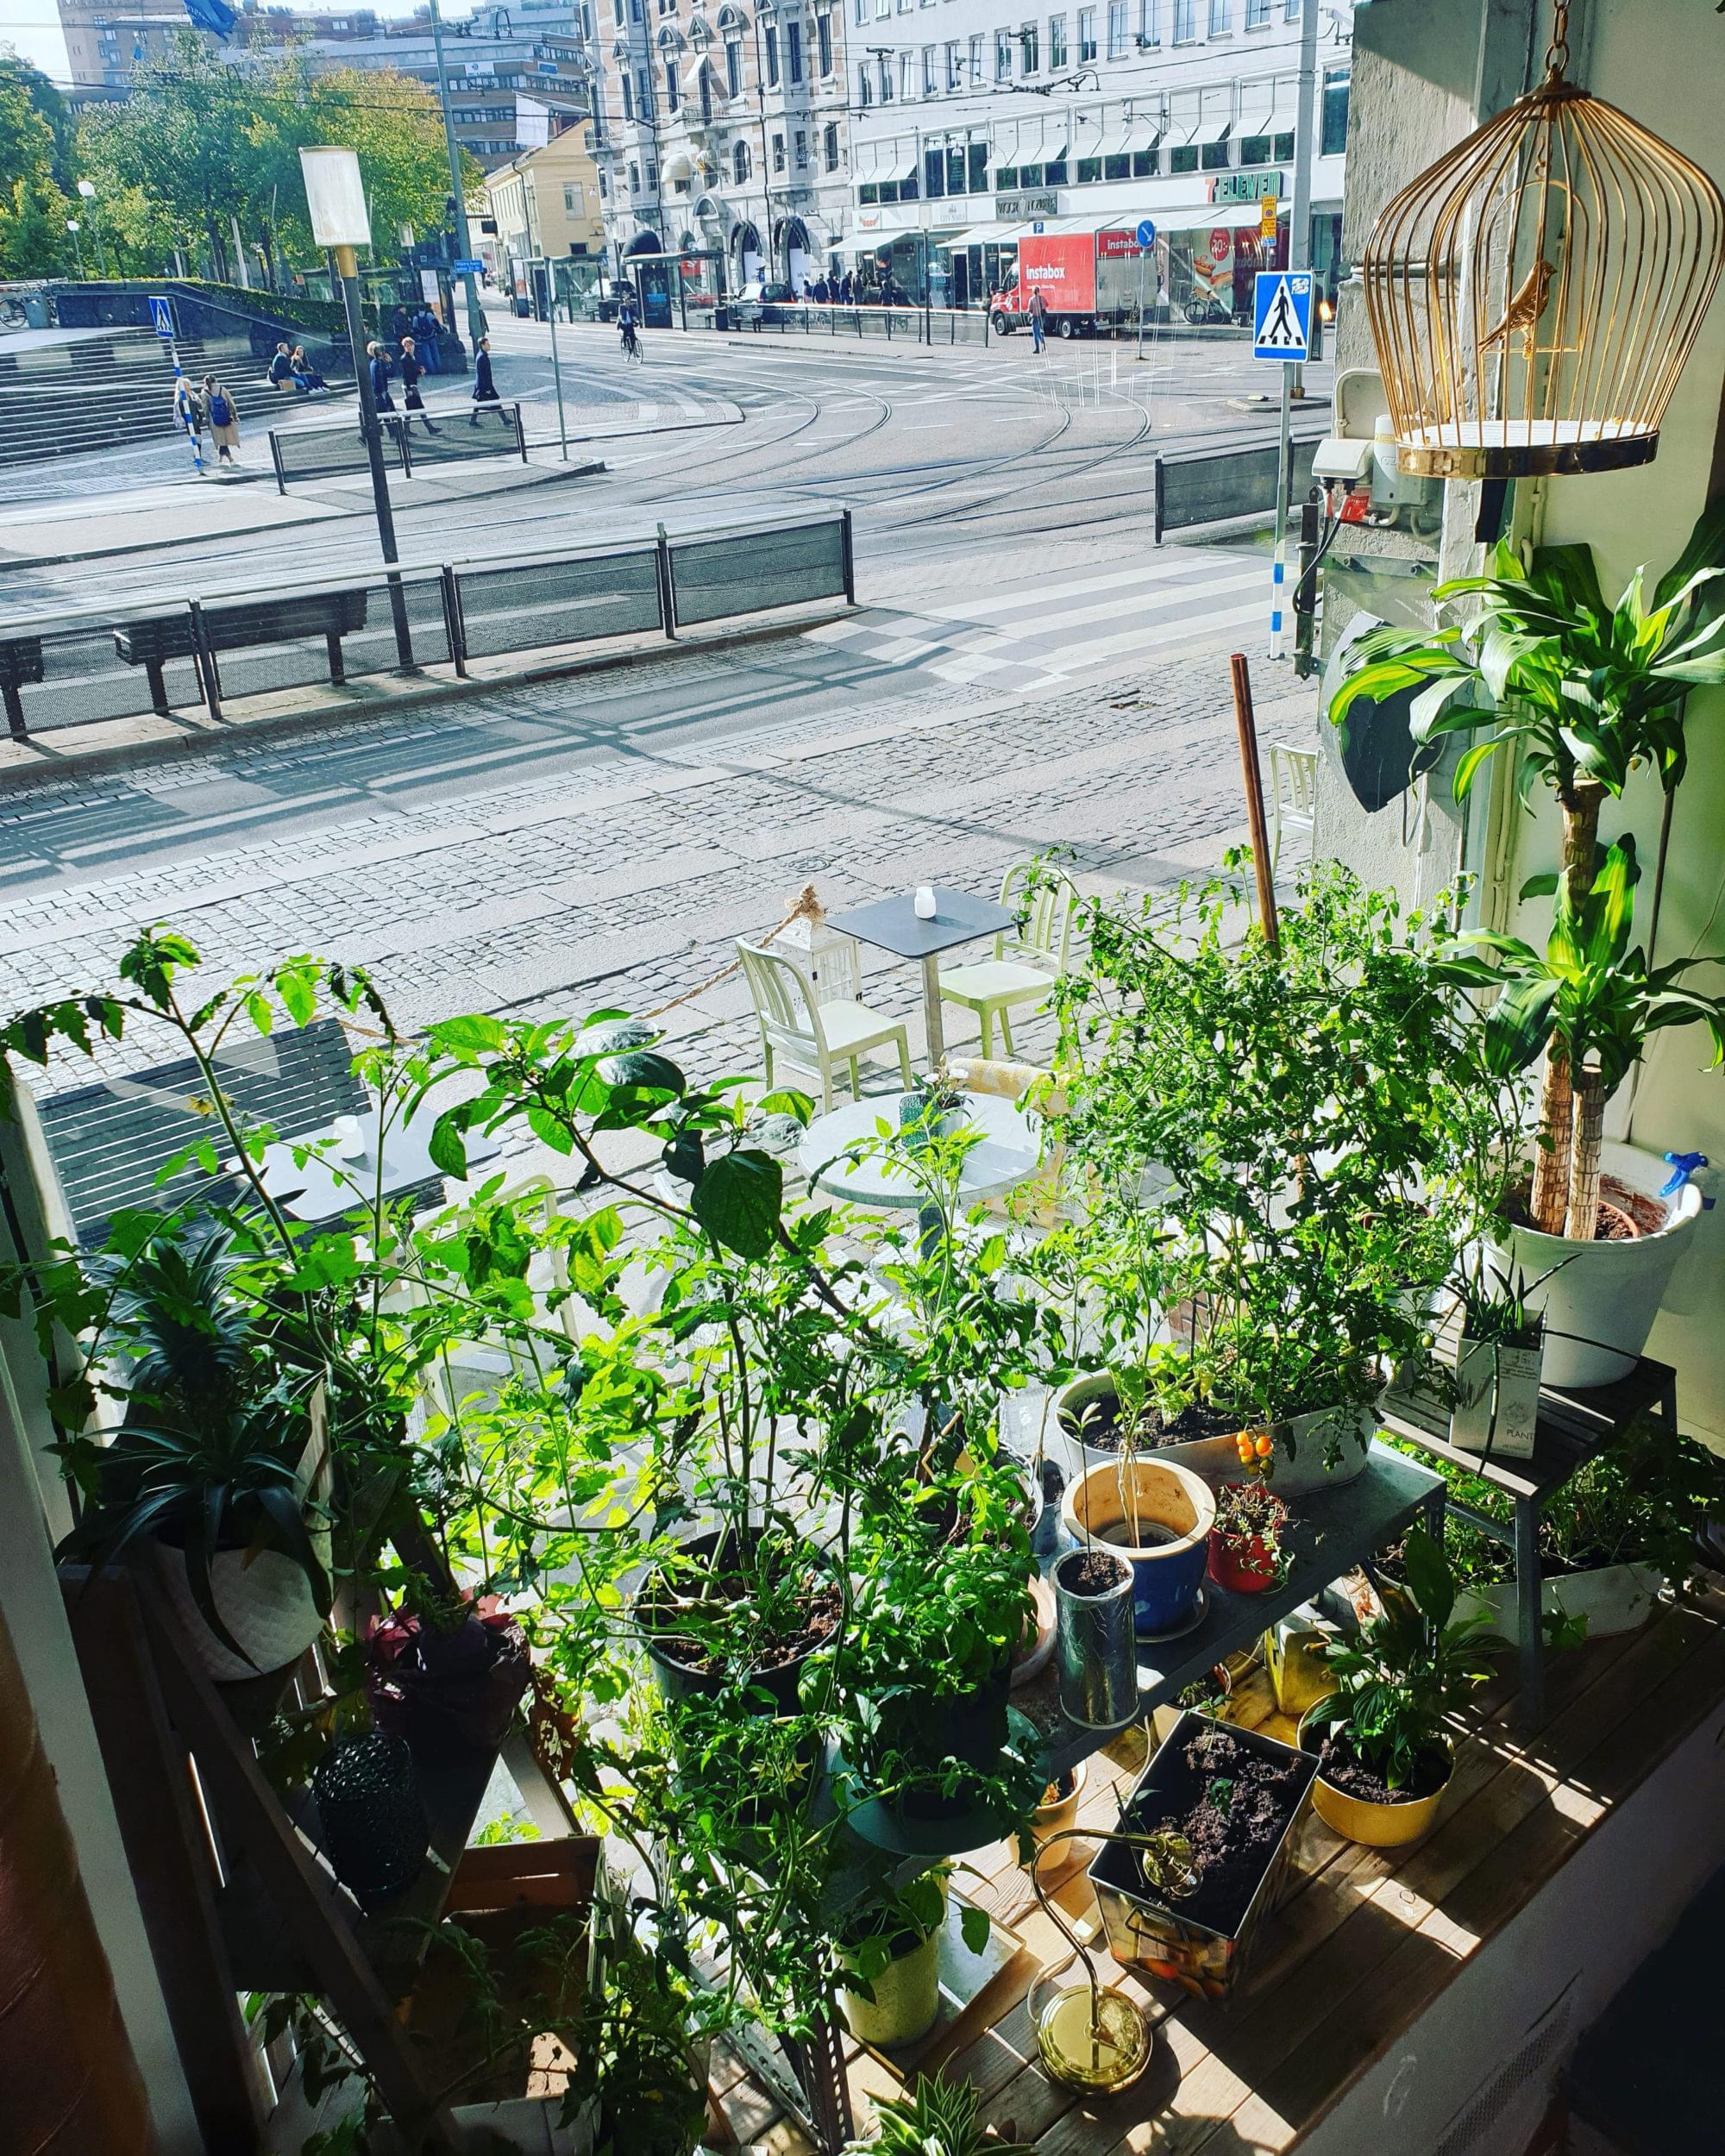 Window view from inside